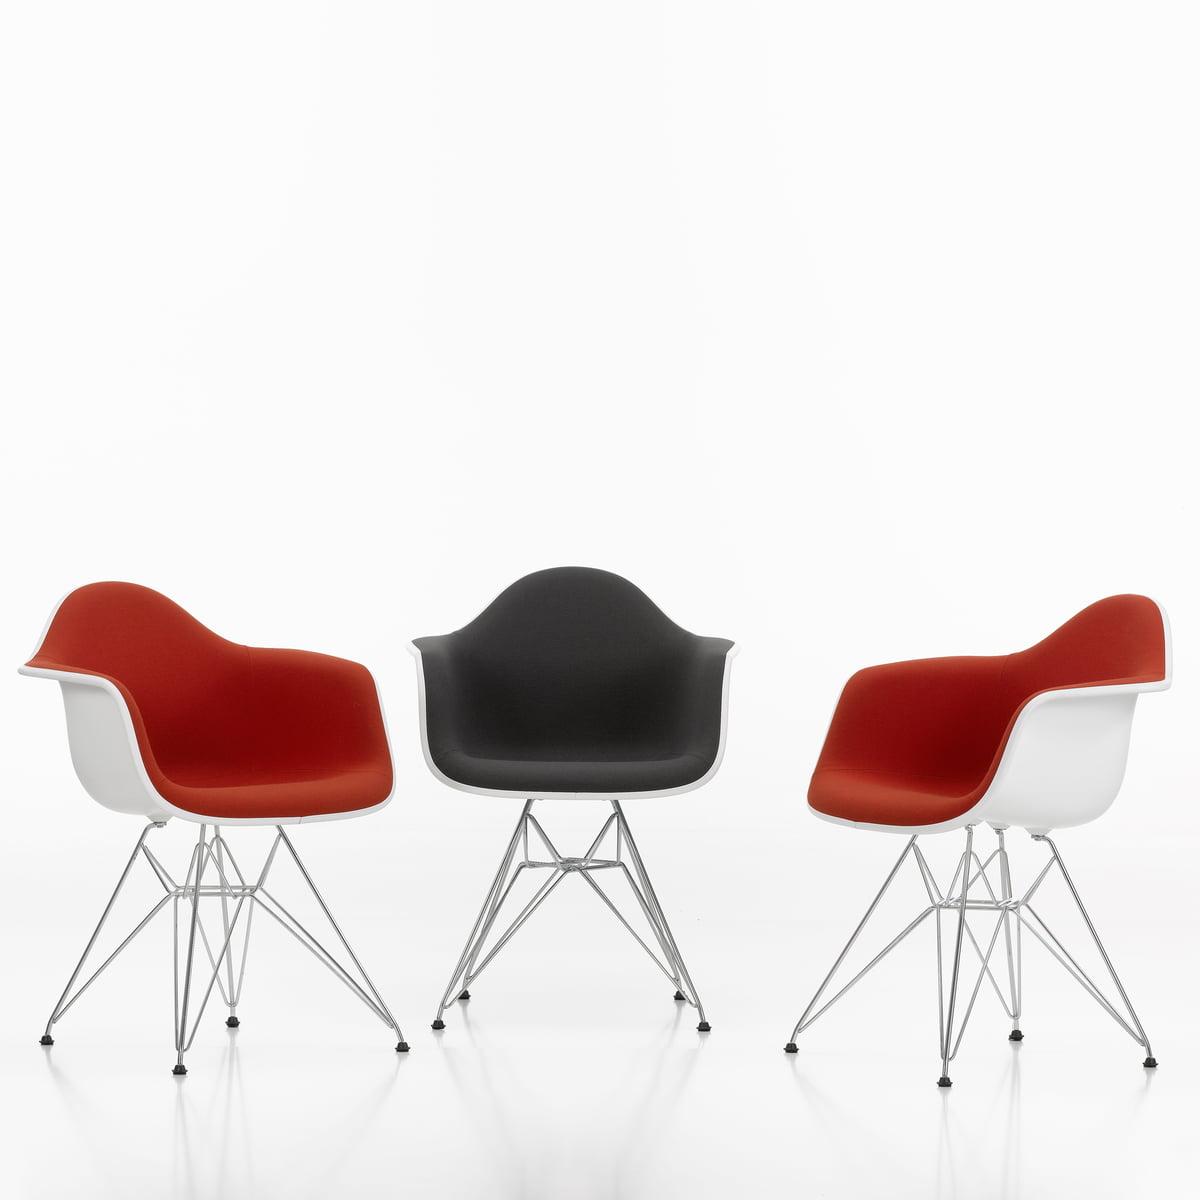 vitra eames plastic armchair dar upholstered. Black Bedroom Furniture Sets. Home Design Ideas